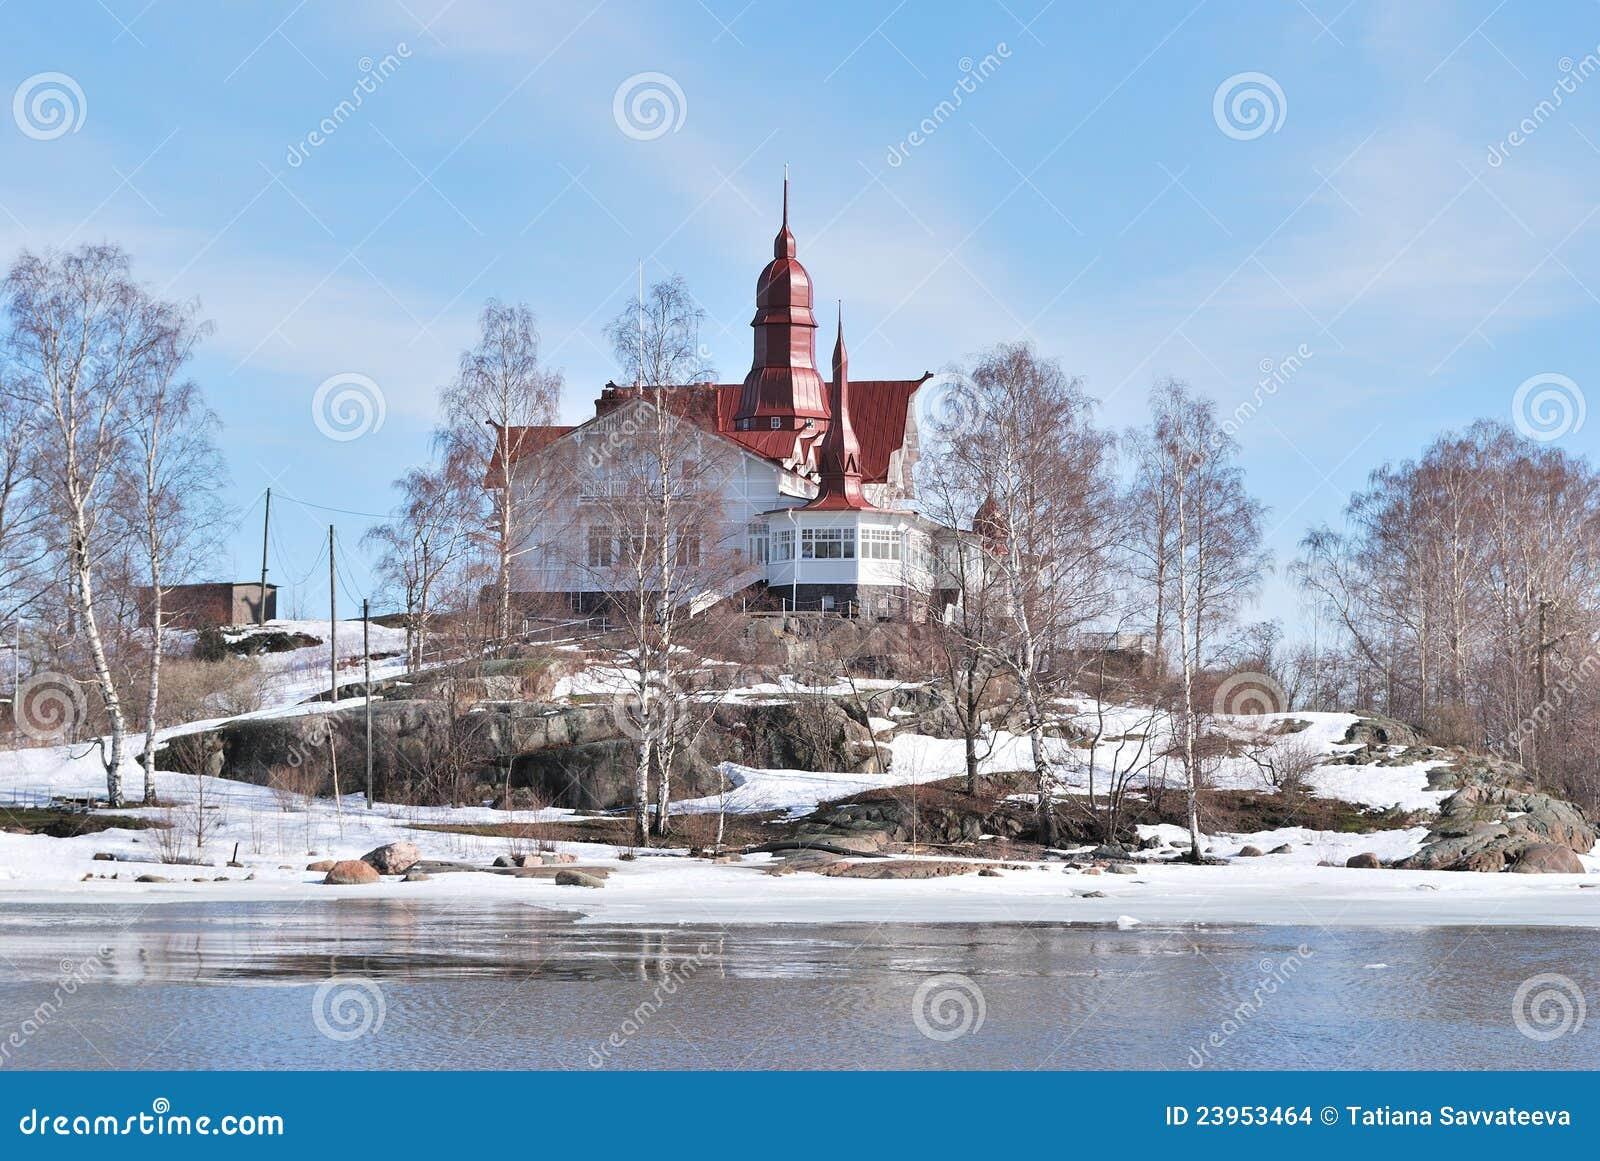 Helsinki. Luoto Island